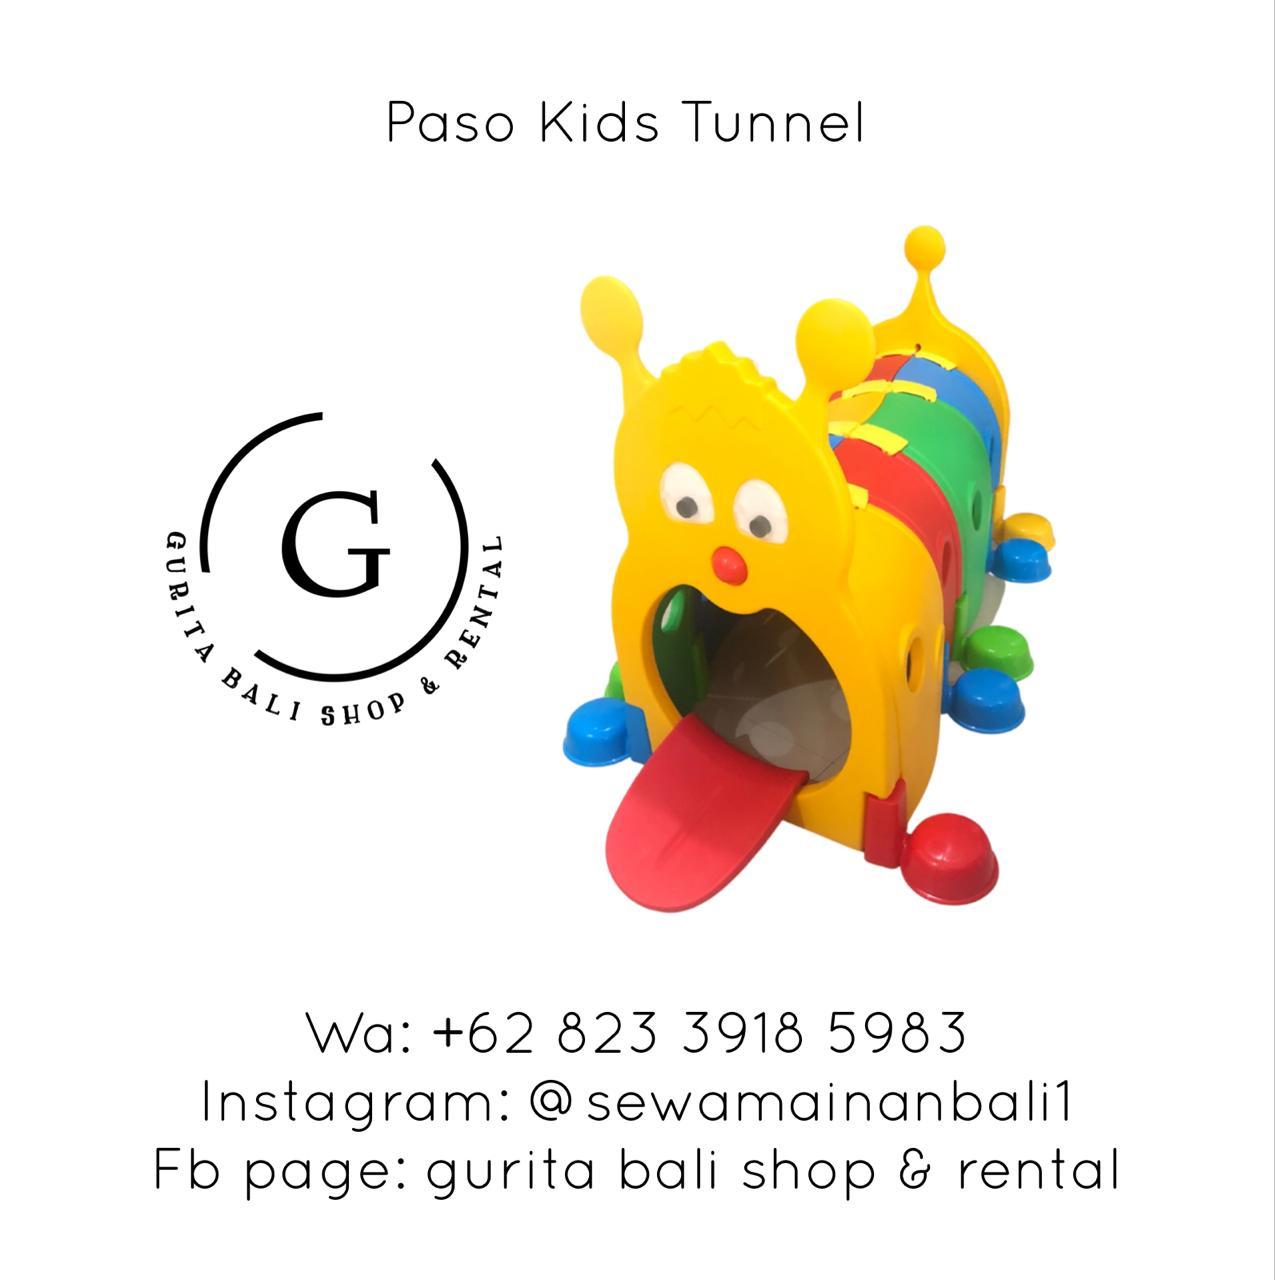 PASO KIDS TUNNEL